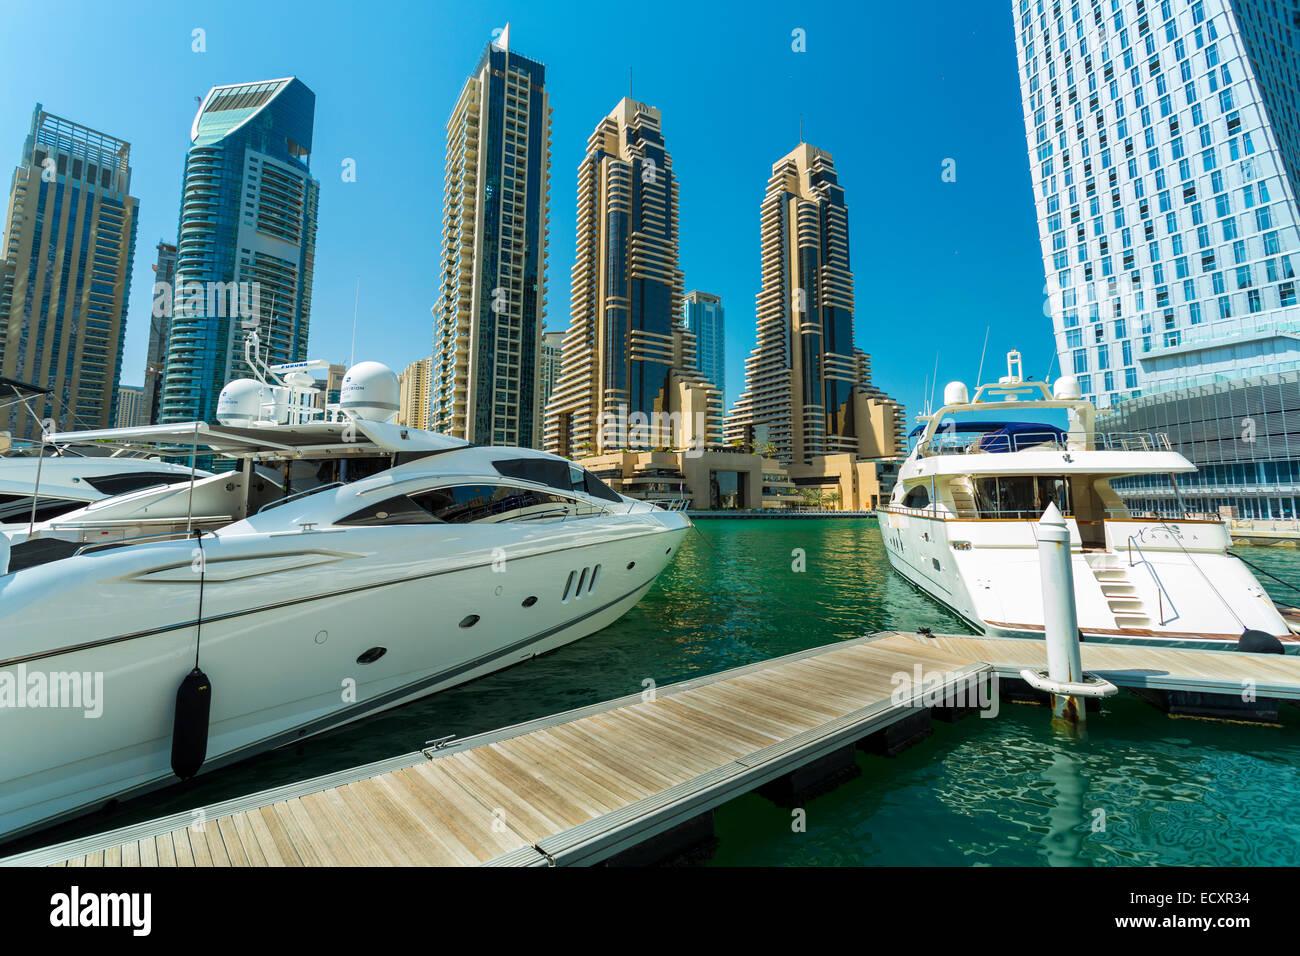 The Dubai Marina and skyline, Dubai, UAE - Stock Image